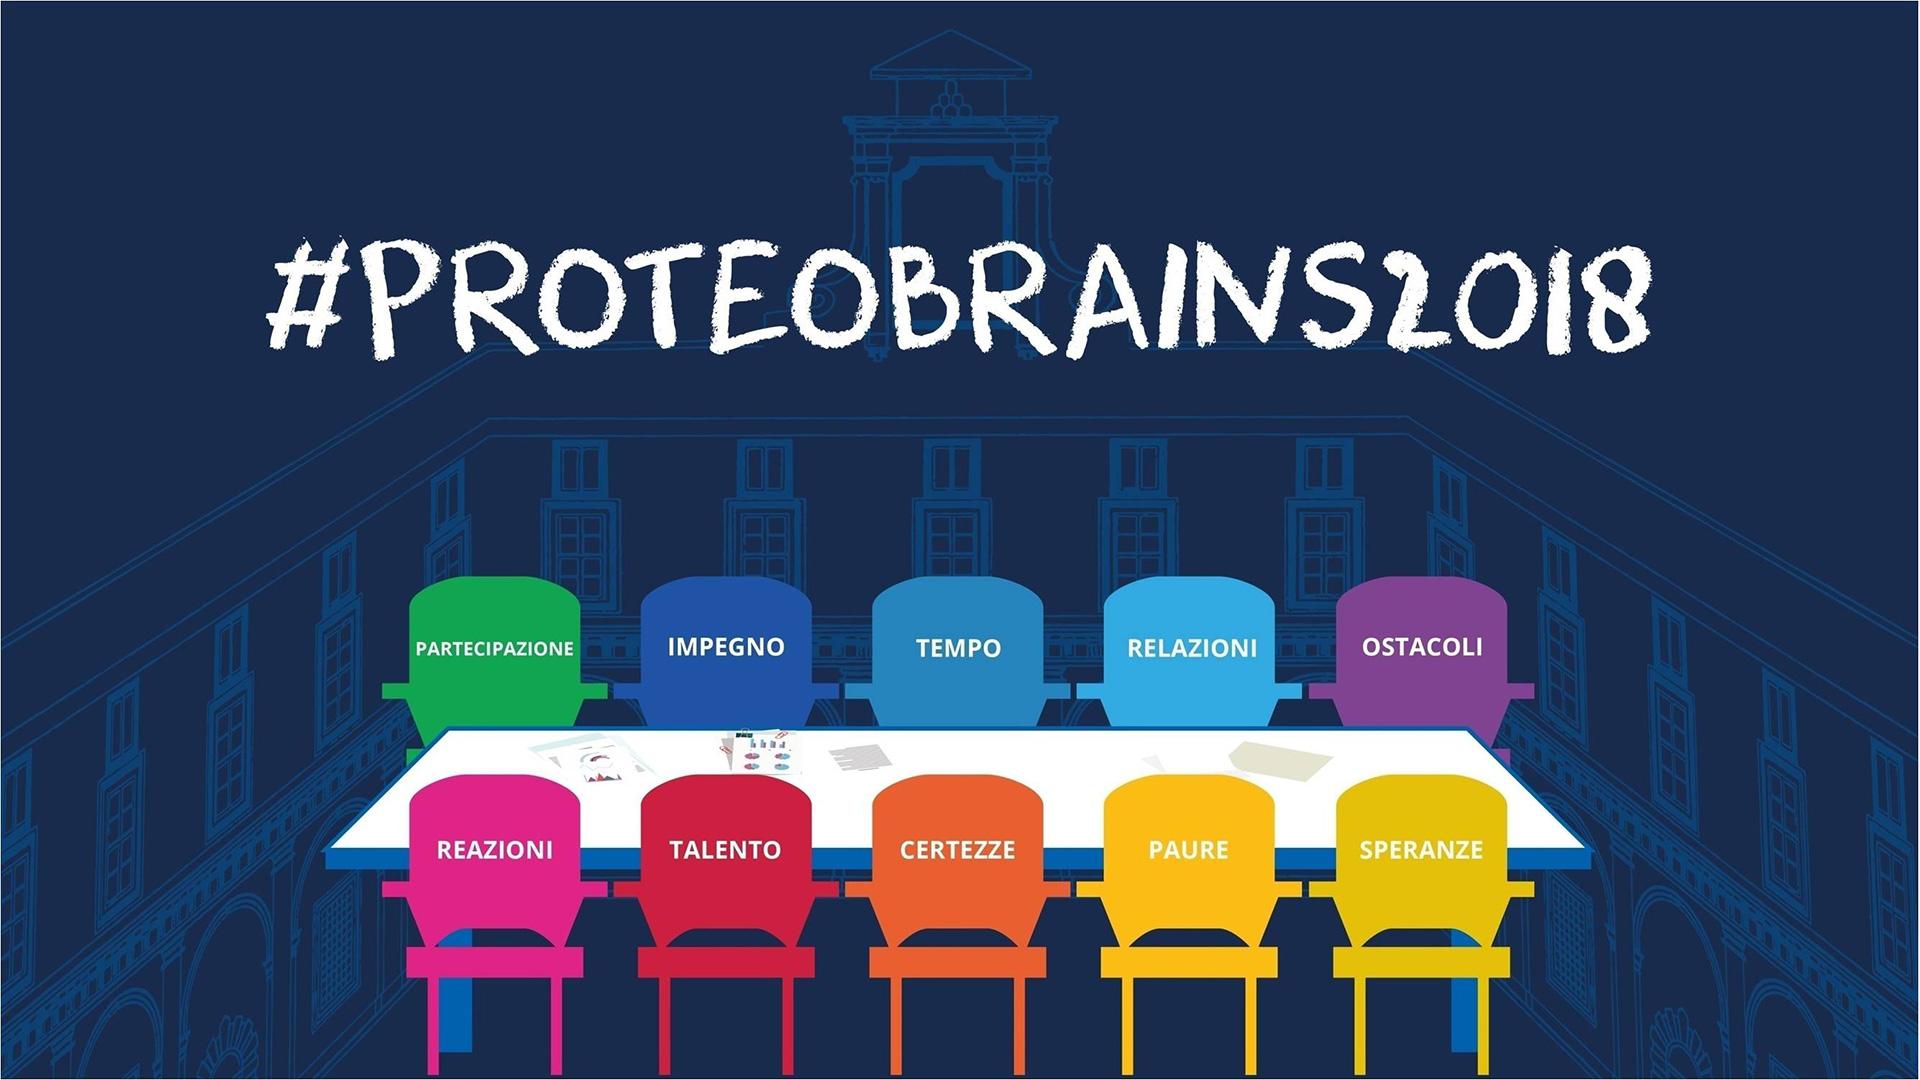 ProteoBrains2018